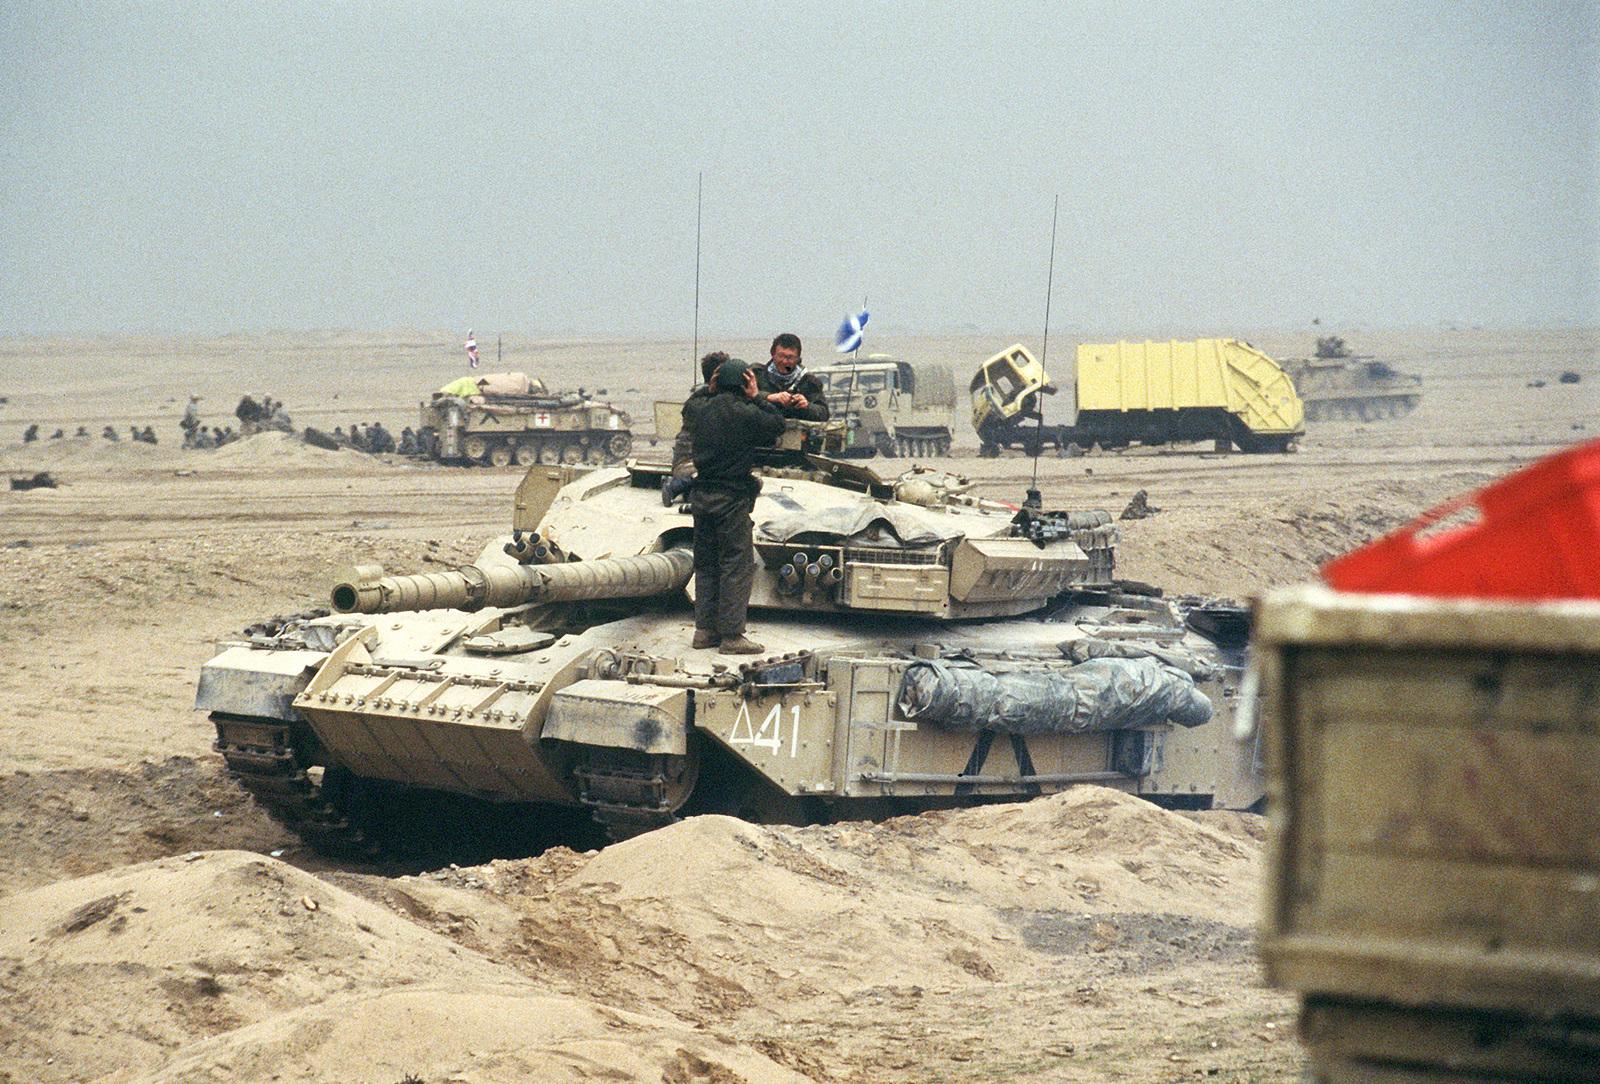 cffb622eeeb9 A British Challenger main battle tank waits by the Basra-Kuwait Highway  near Kuwait City following ...